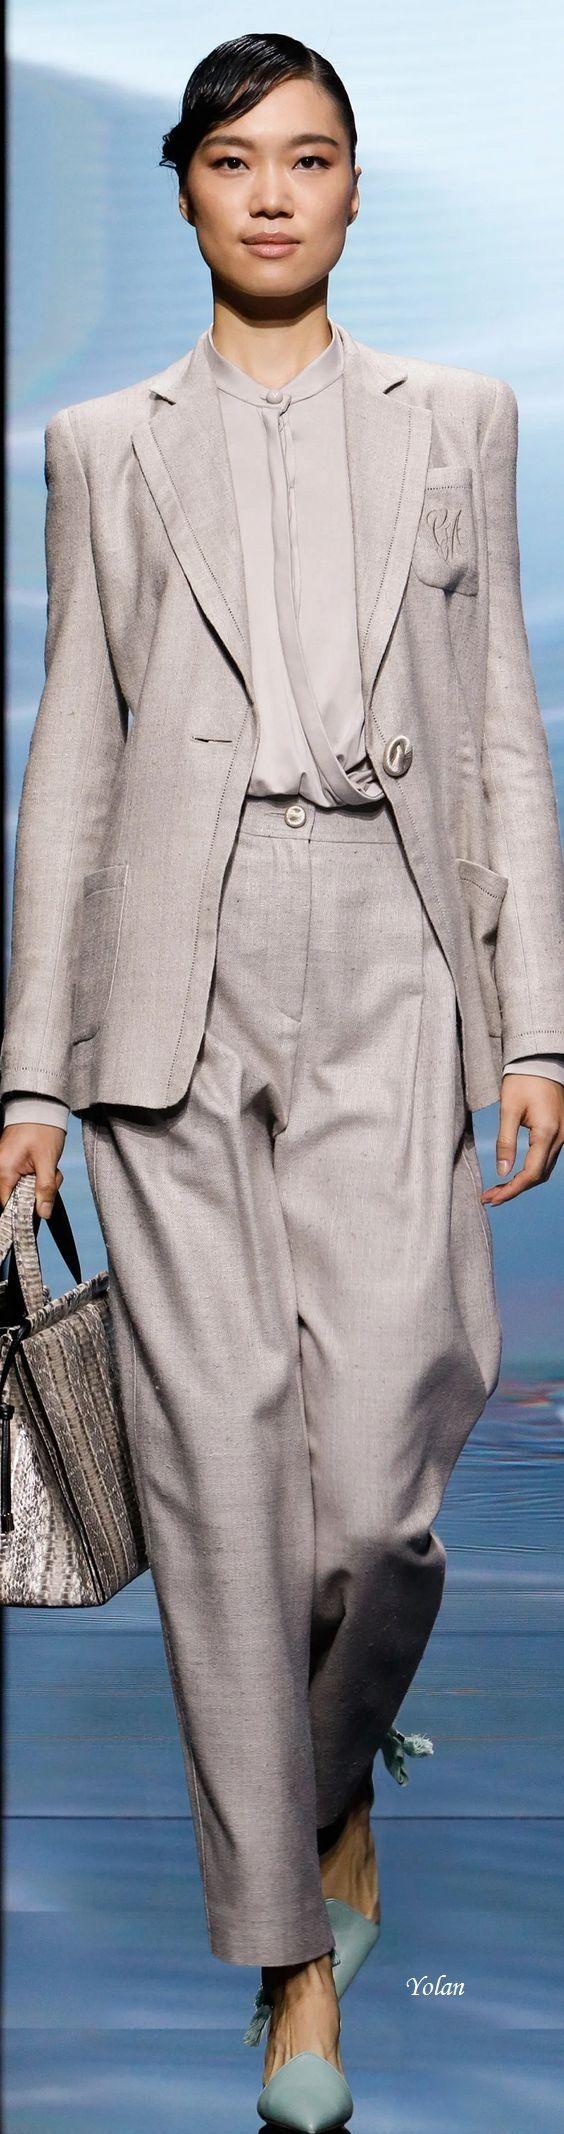 Emporio Armani 2021 Pantalones De Moda Giorgio Armani Moda